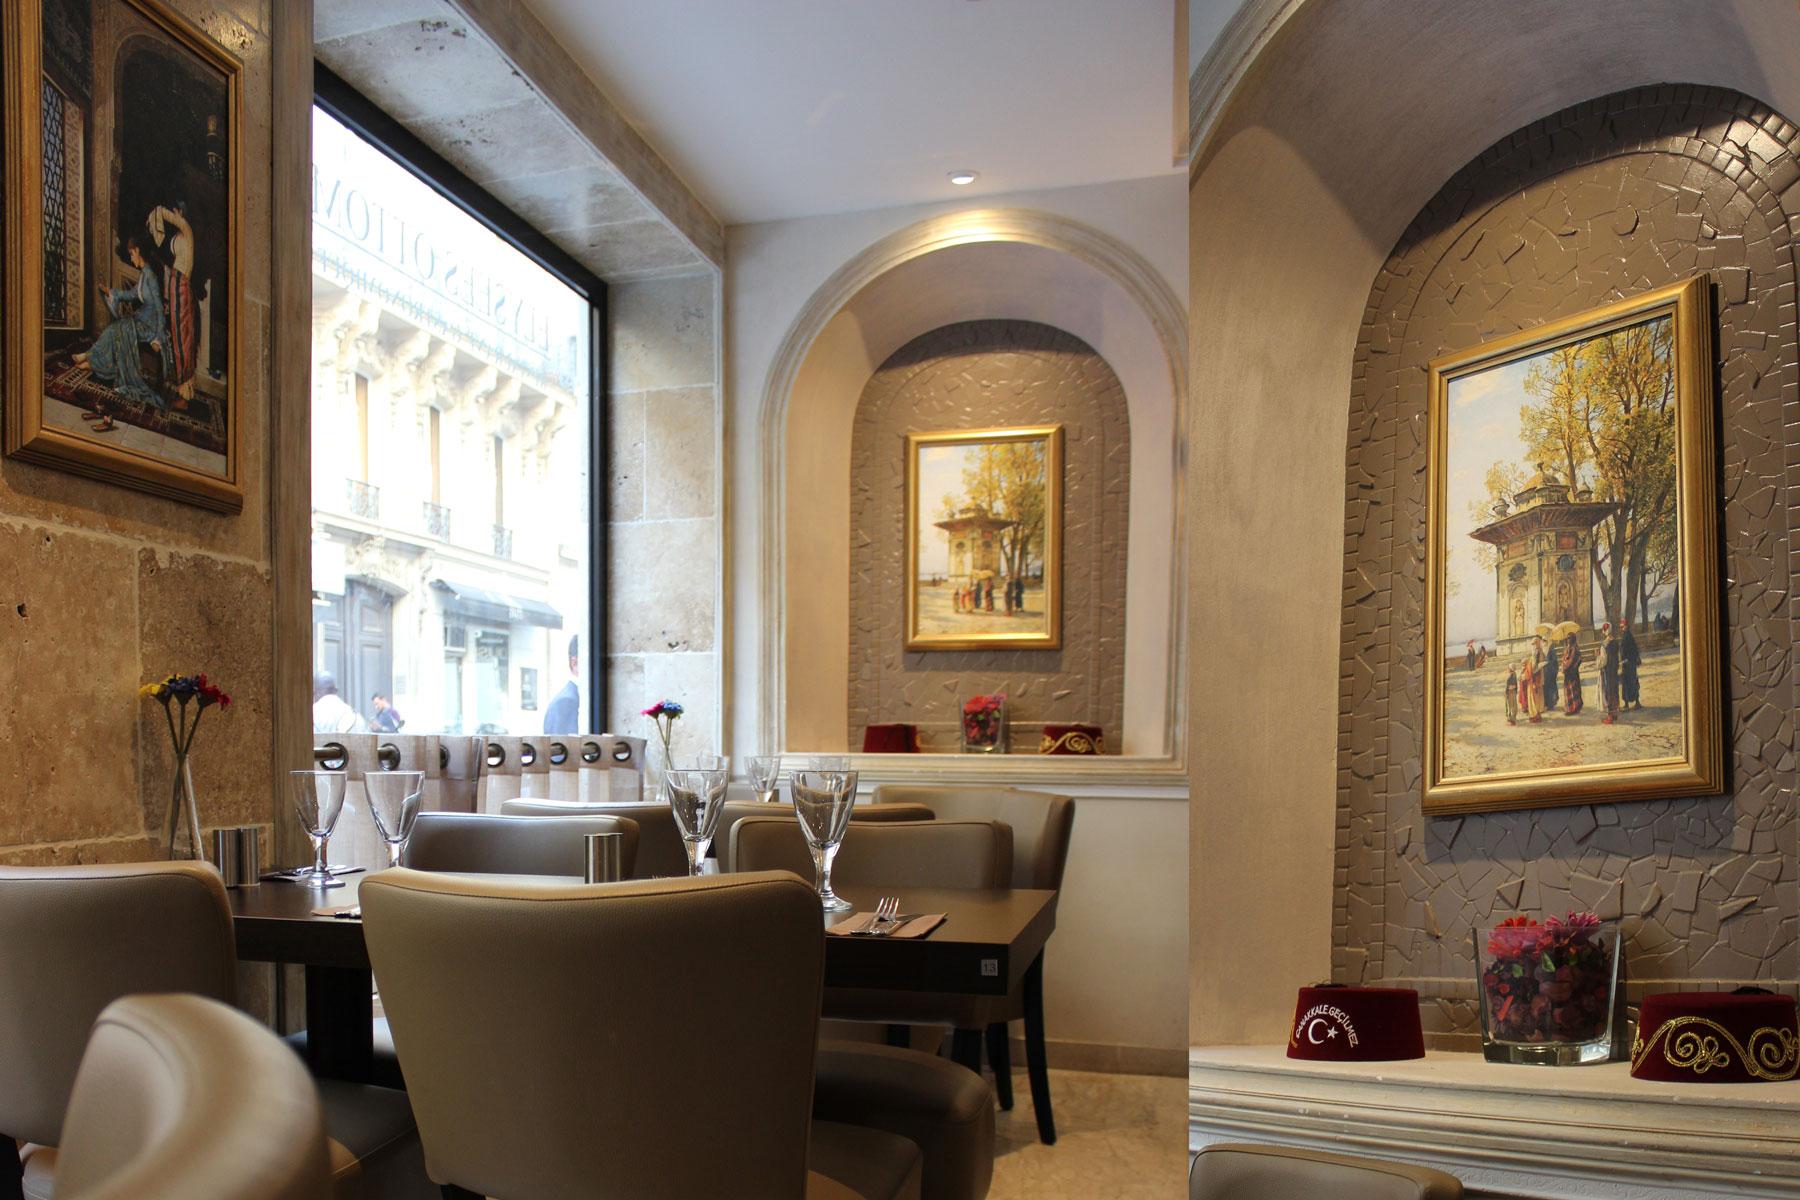 restaurantottomant_int5